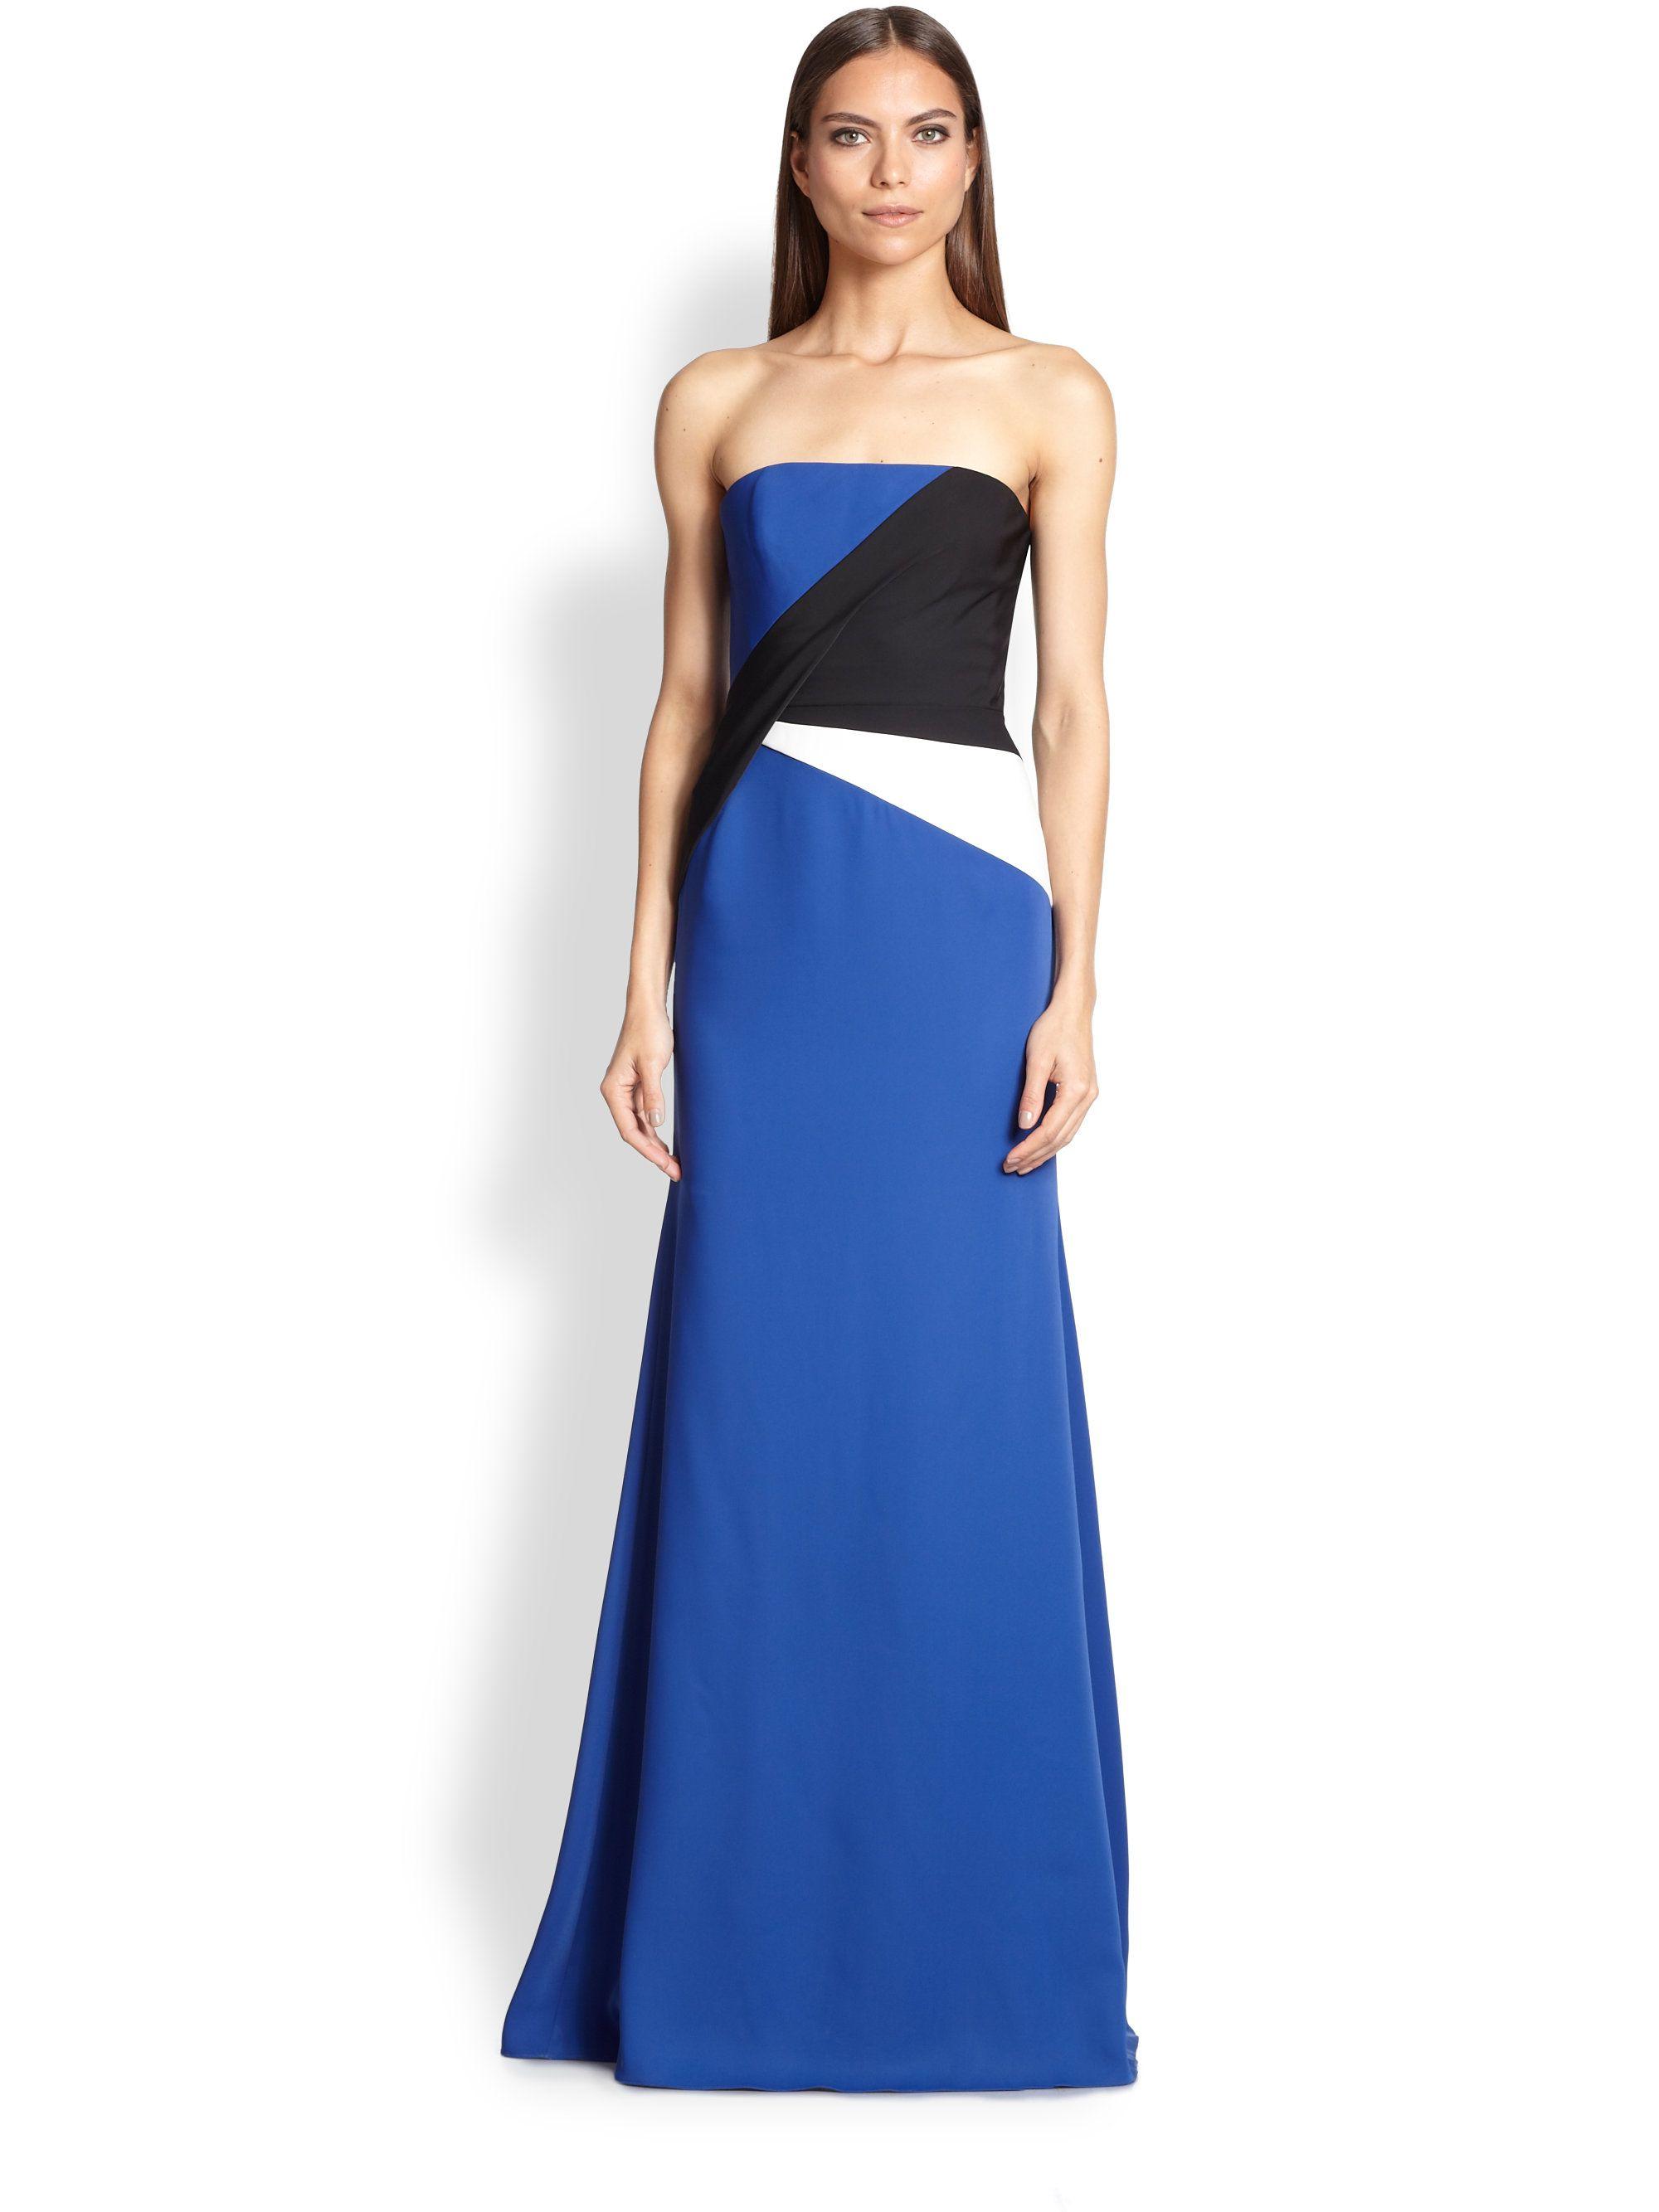 Bcbgmaxazria blue colorblock gown strapless dress formal